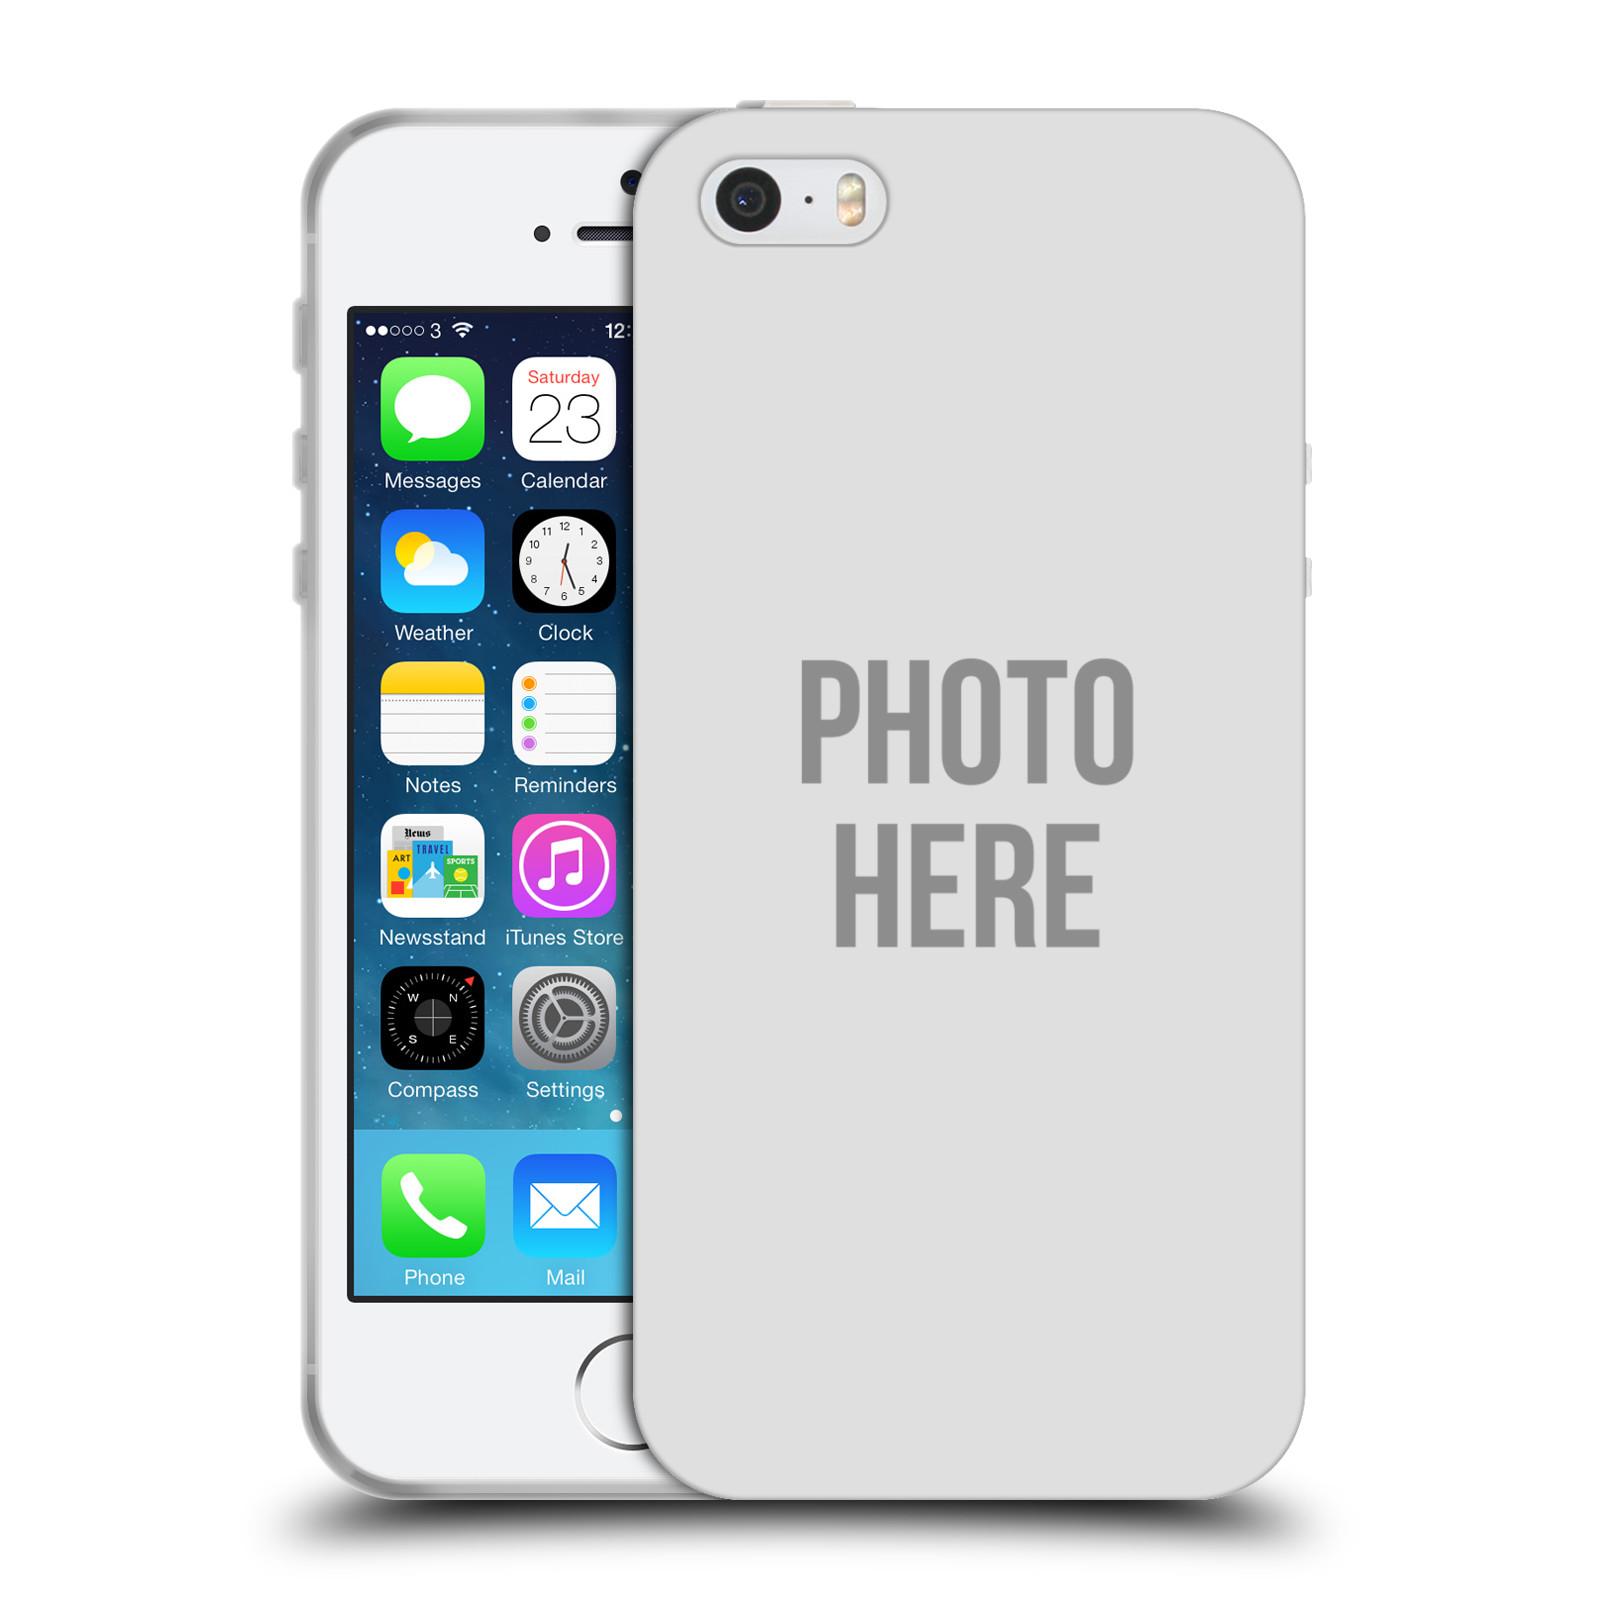 Silikonové pouzdro na mobil Apple iPhone 5 ac4ca441593